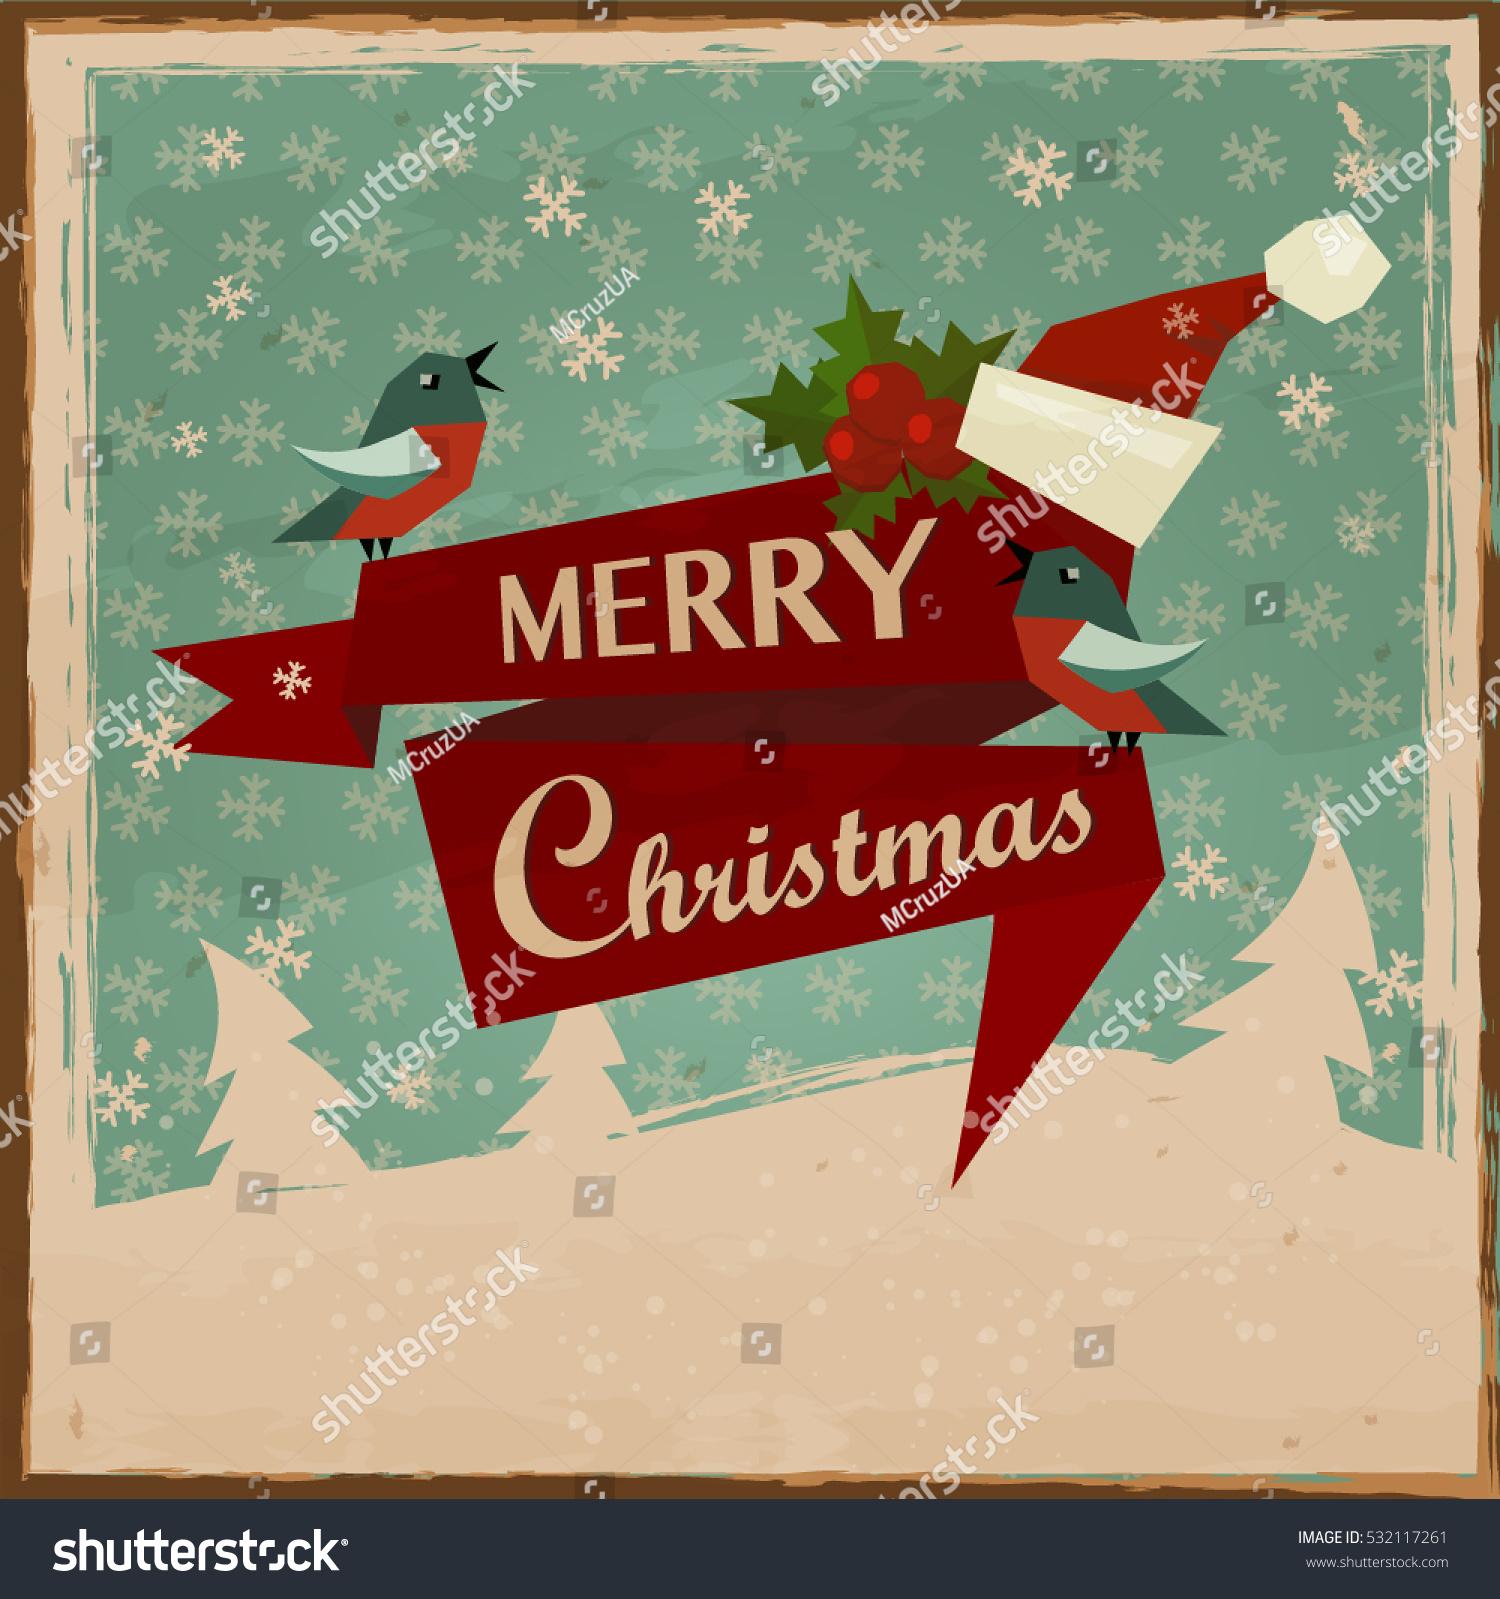 Vintage Merry Christmas Cards Vector Background Santa Stock Vector ...